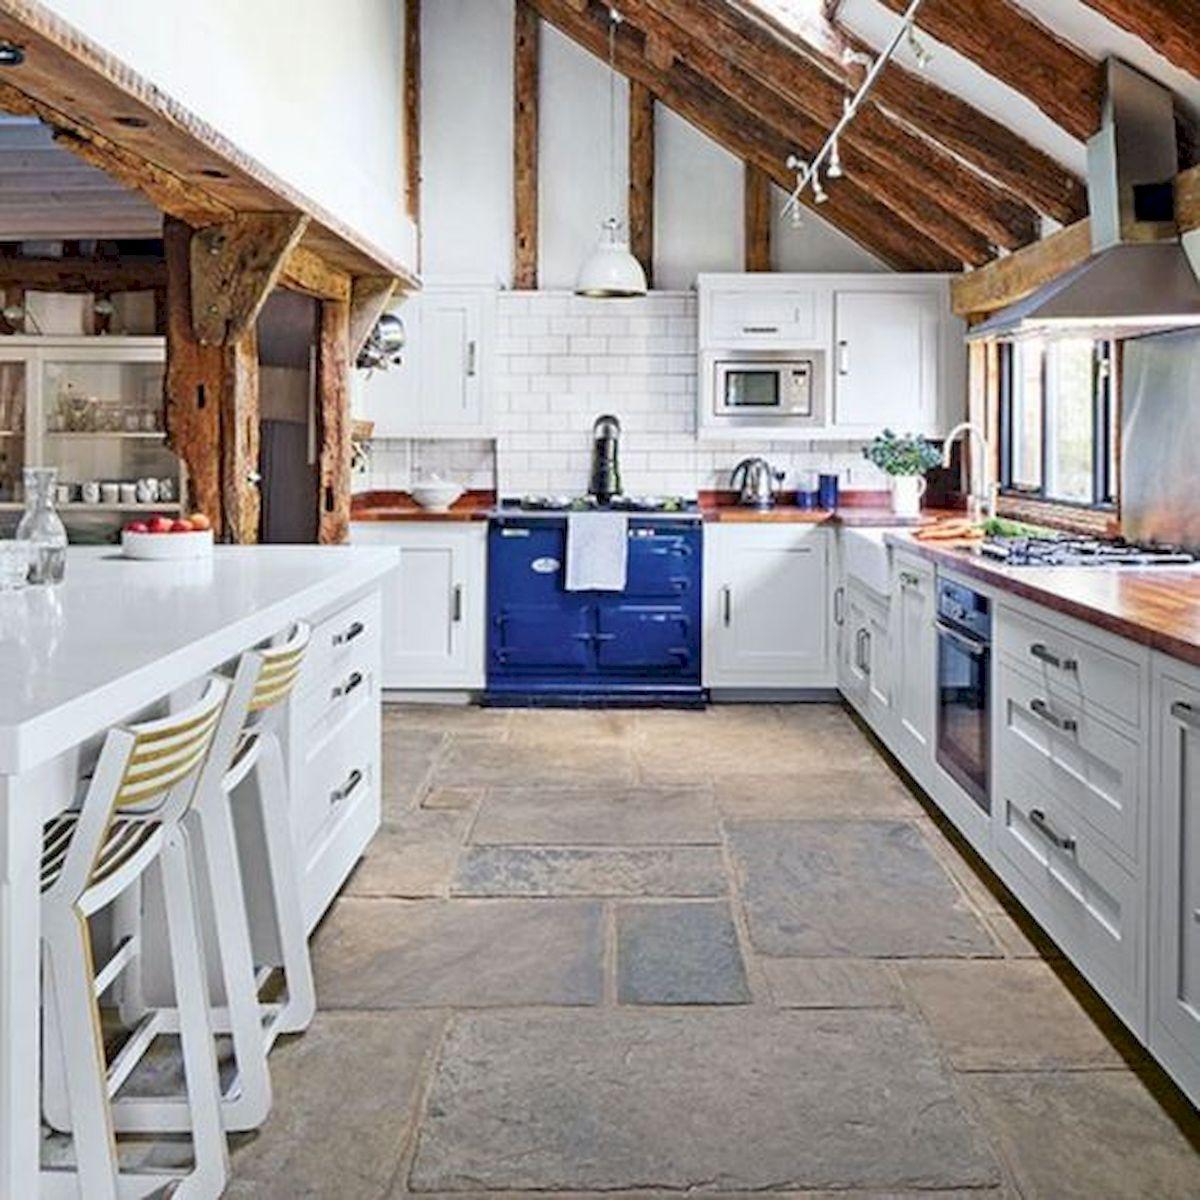 30 Best Kitchen Floor Tile Design Ideas With Concrete Floor Ideas (10)